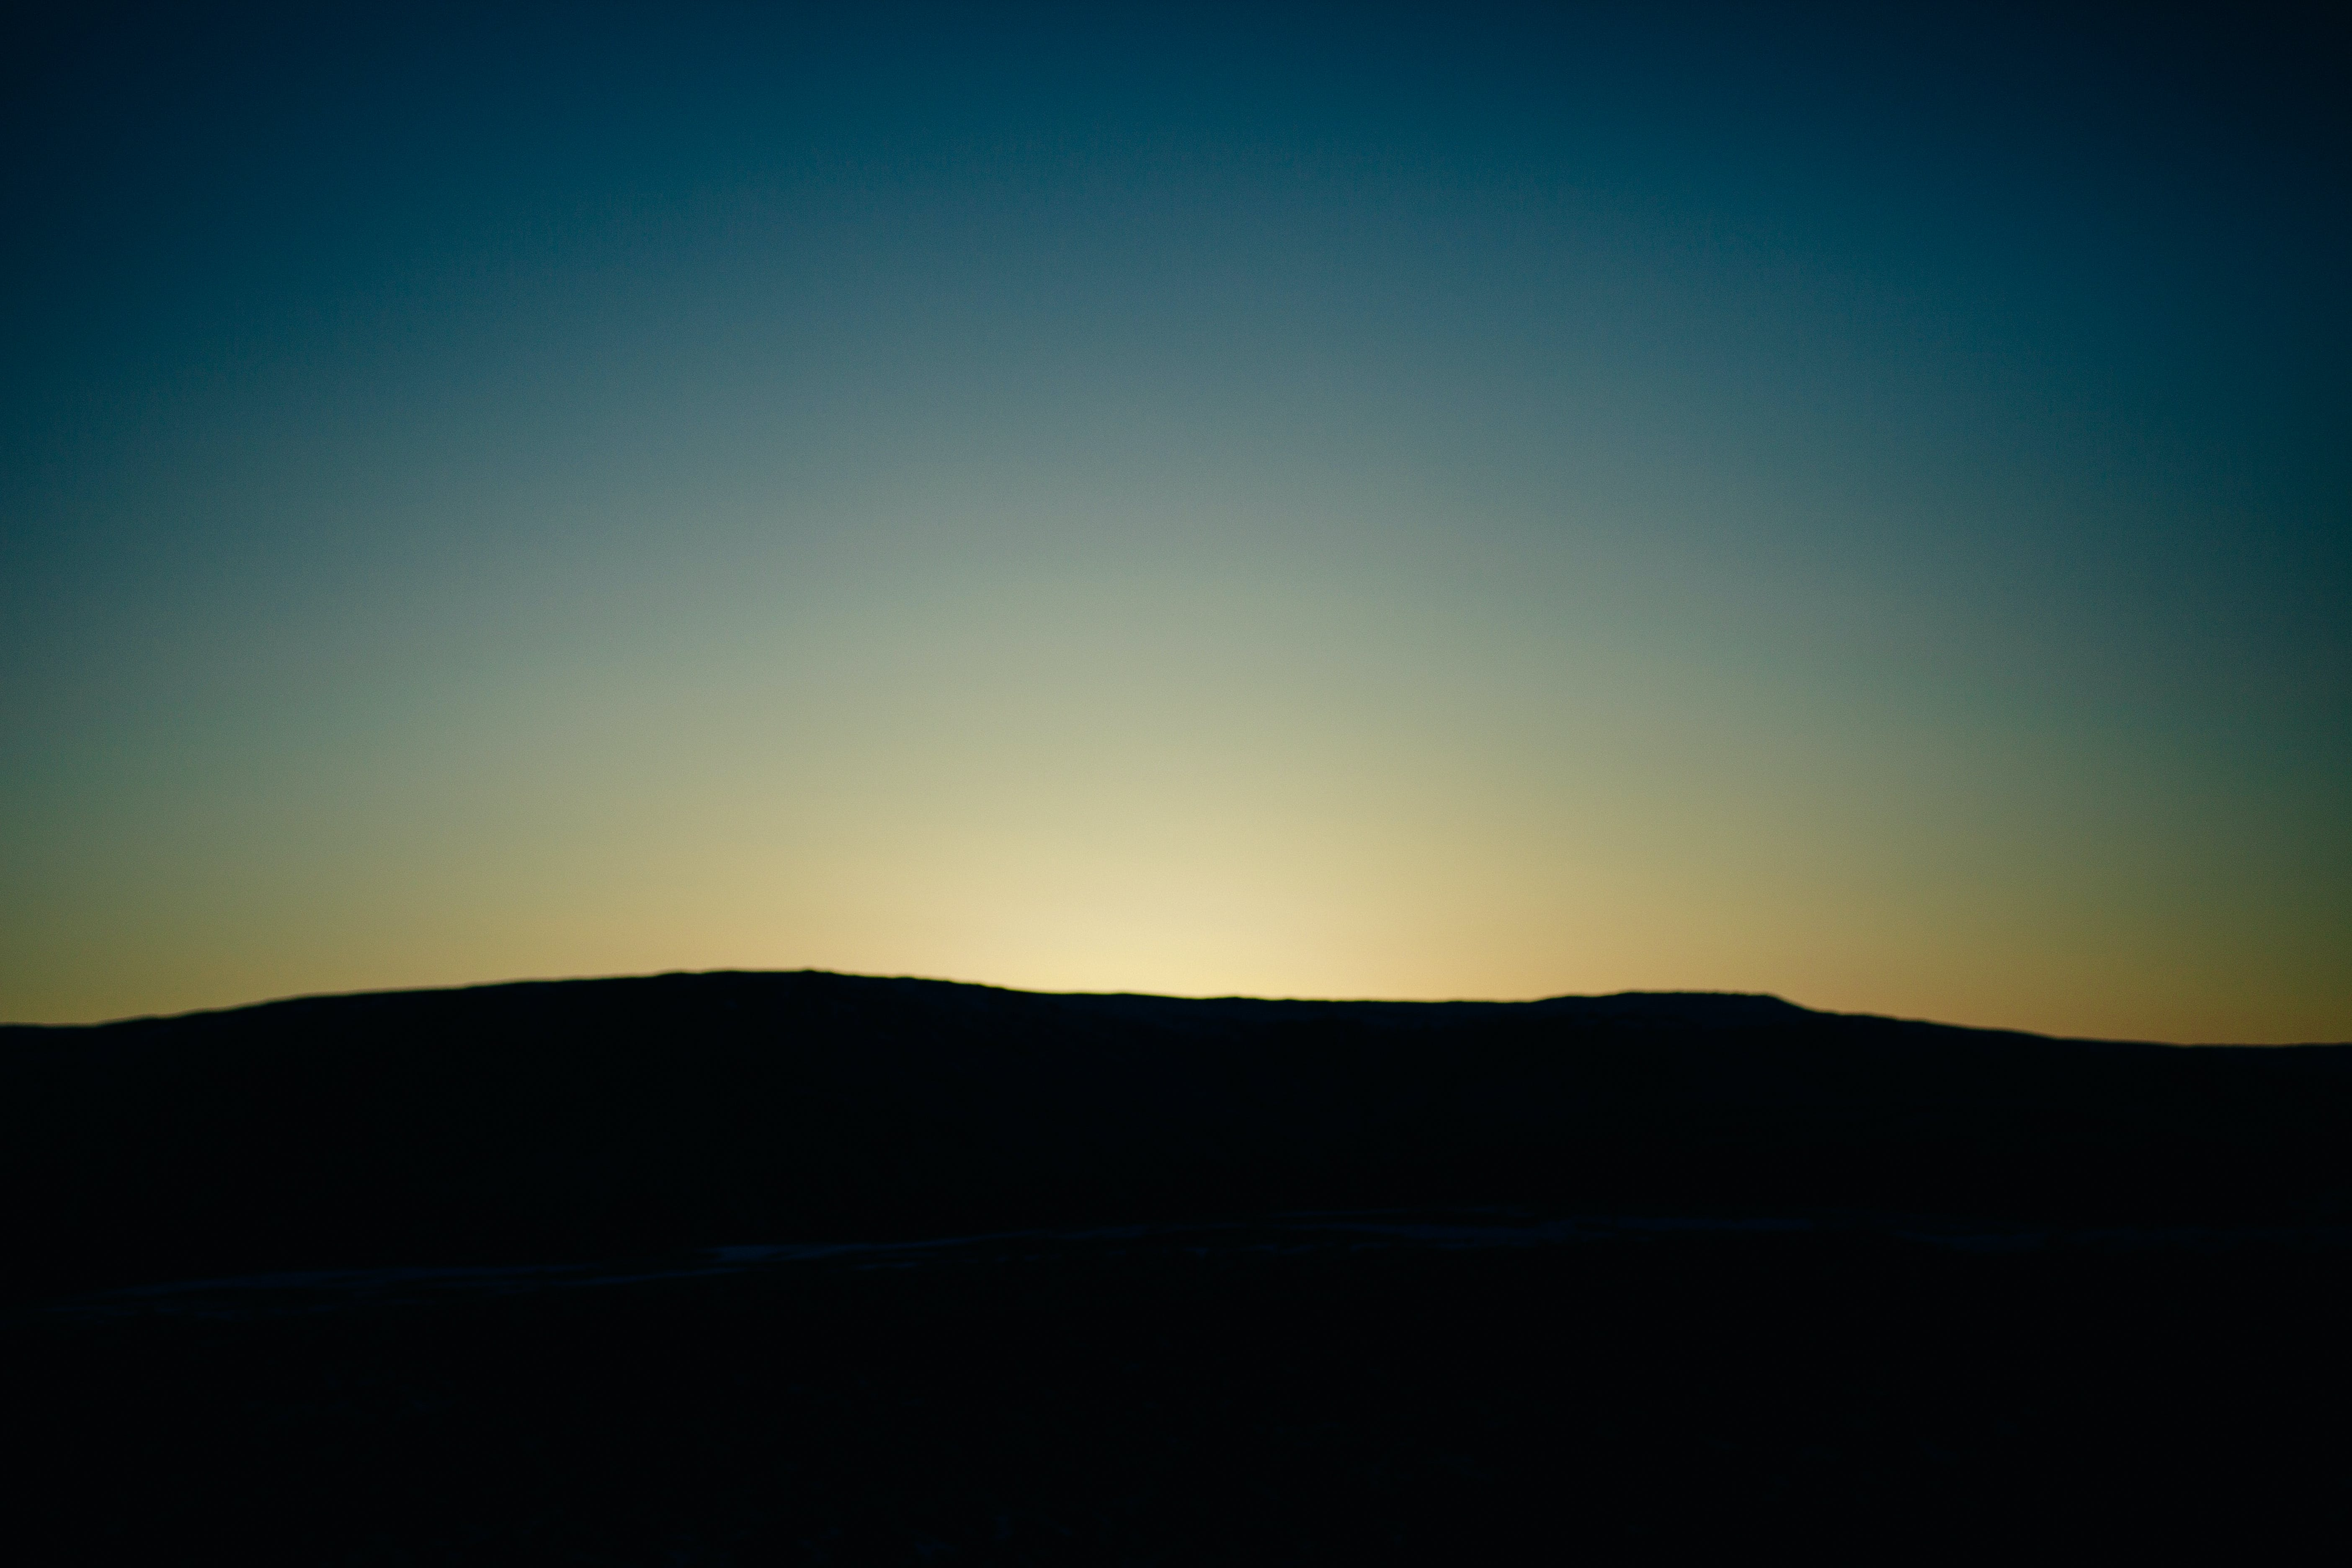 Fotobanka sbezplatnými fotkami na tému noc, súmrak, svitanie, tmavý